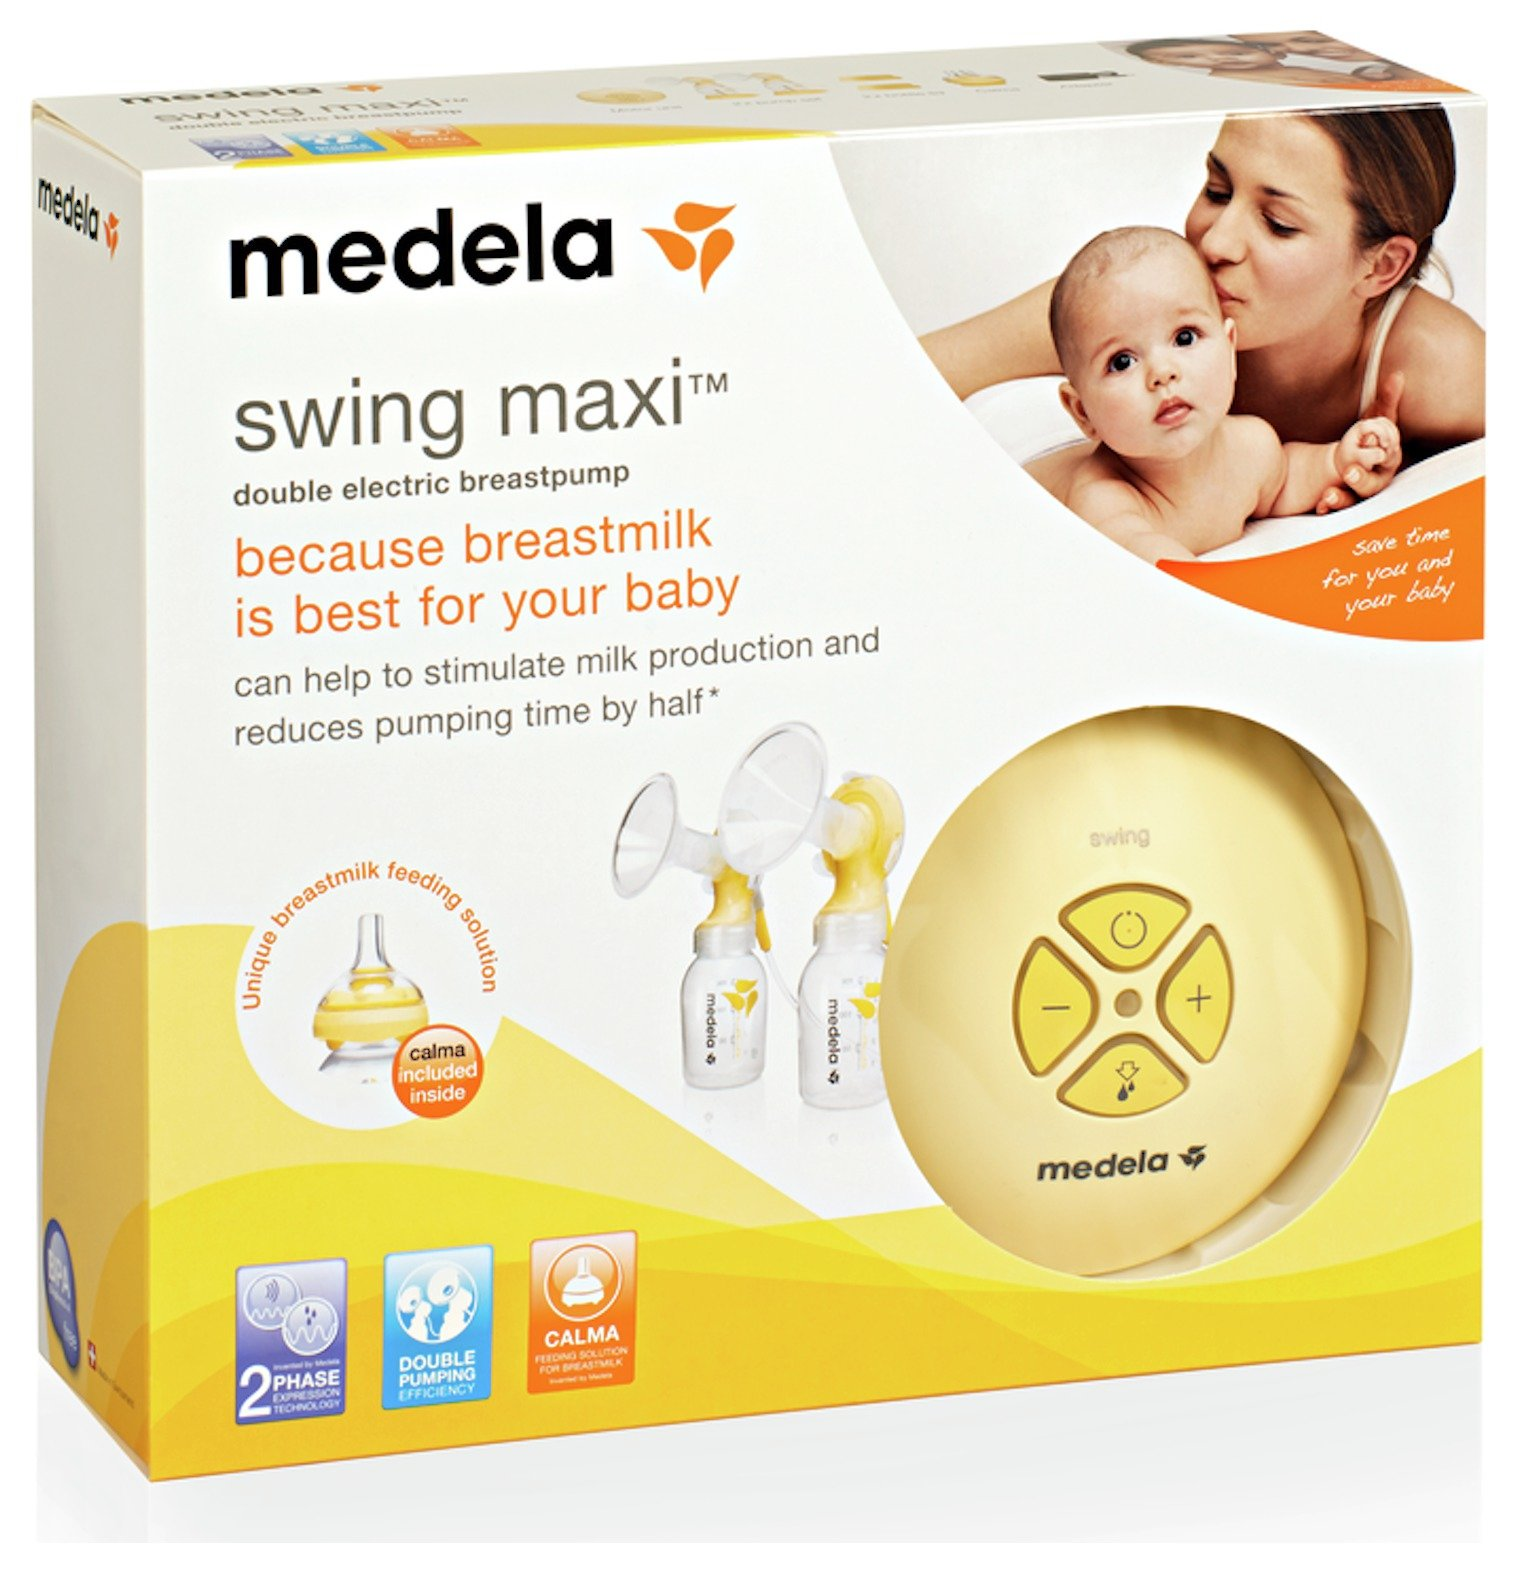 Ean 7612367040105 Medela Swing Maxi Double Electric Breastpump